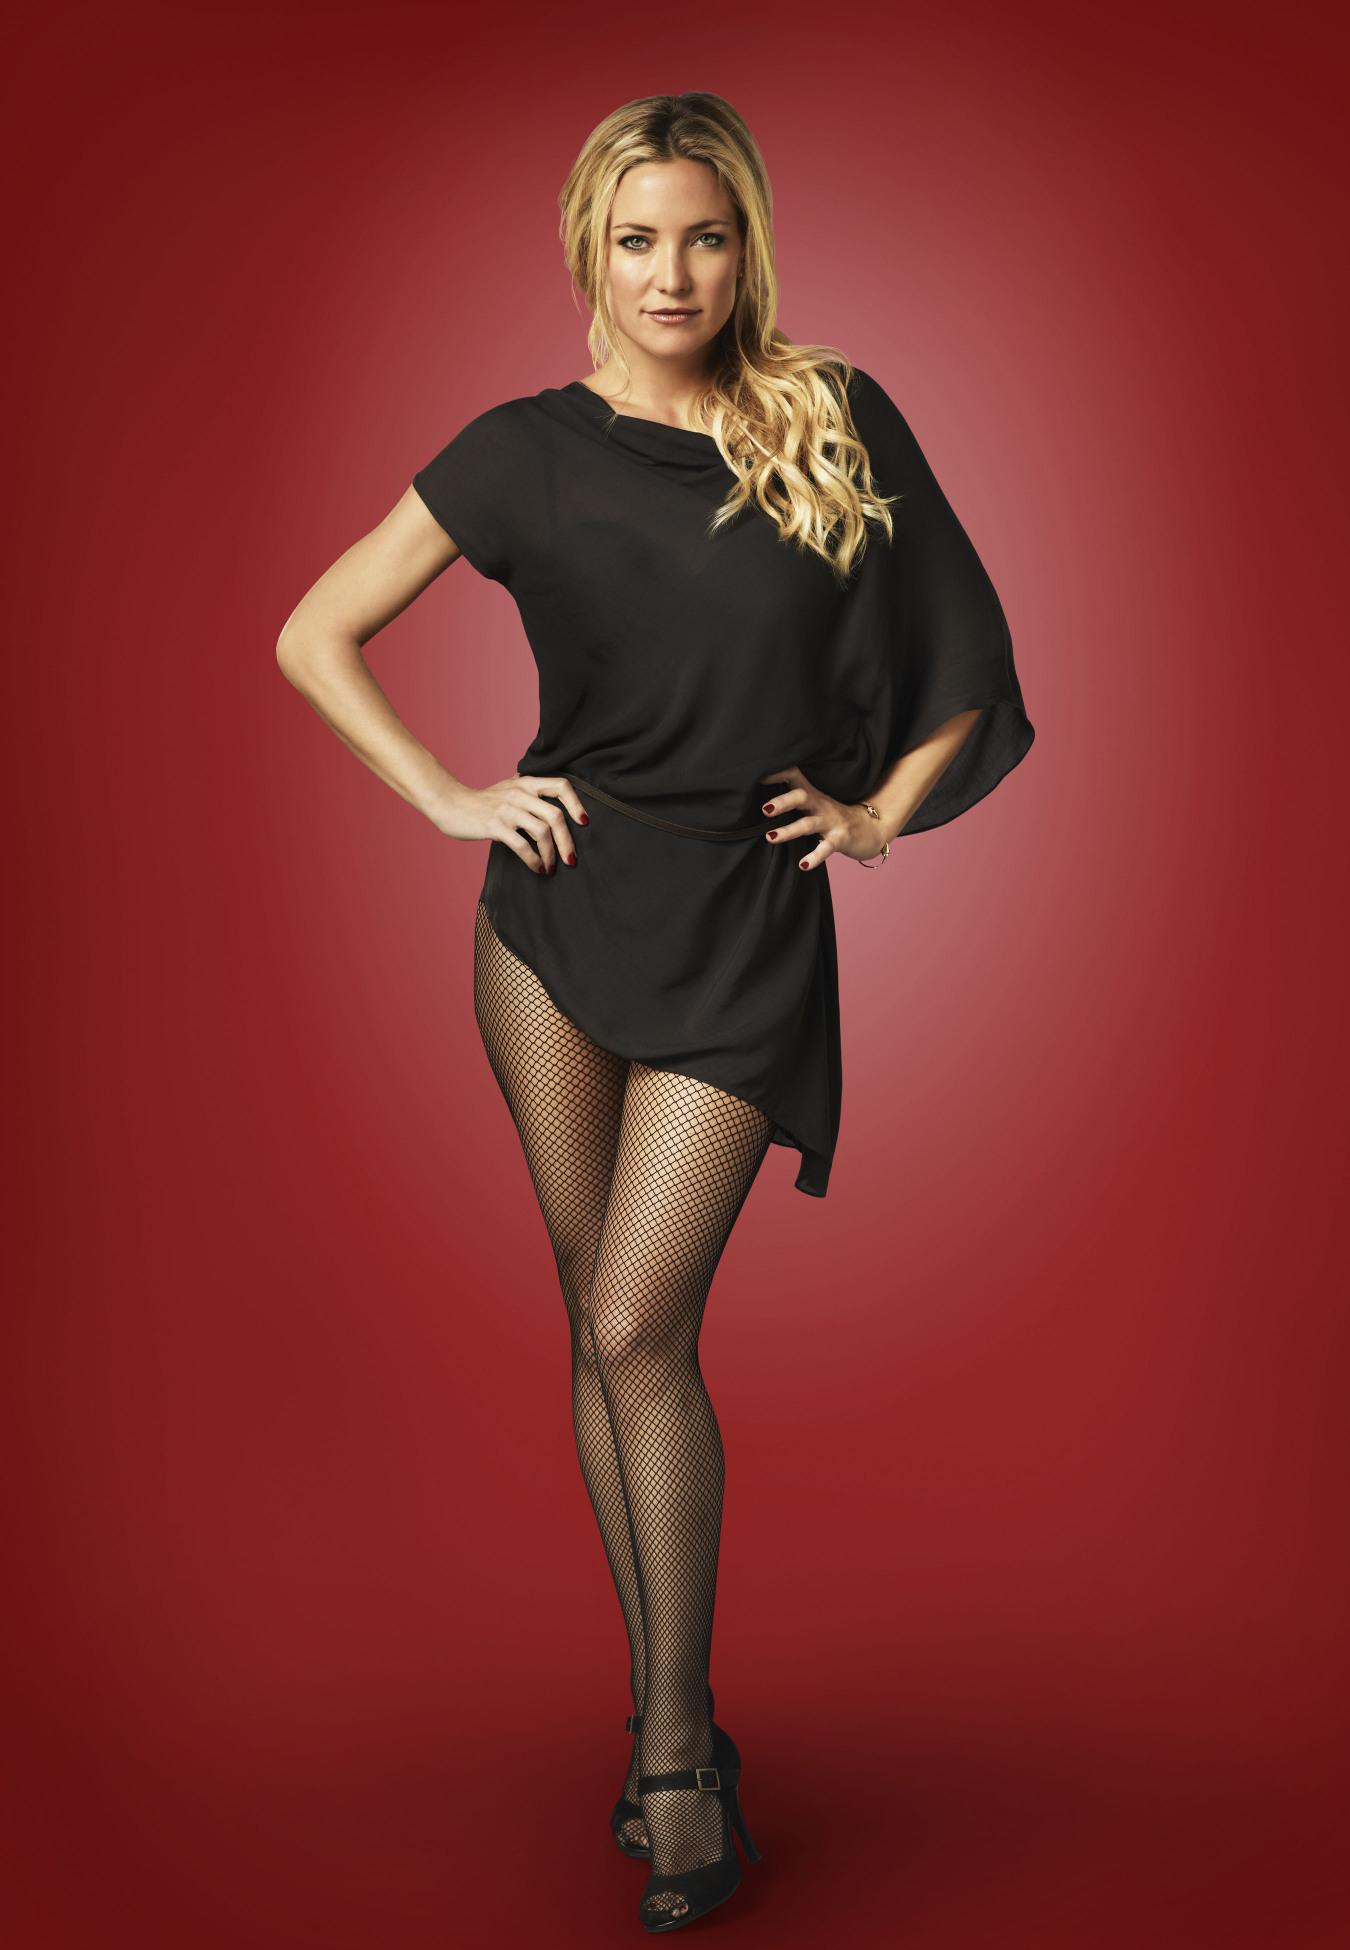 Glee 43-kate-hudson-01 5535 jw1.jpg - Kate Hudson PNG